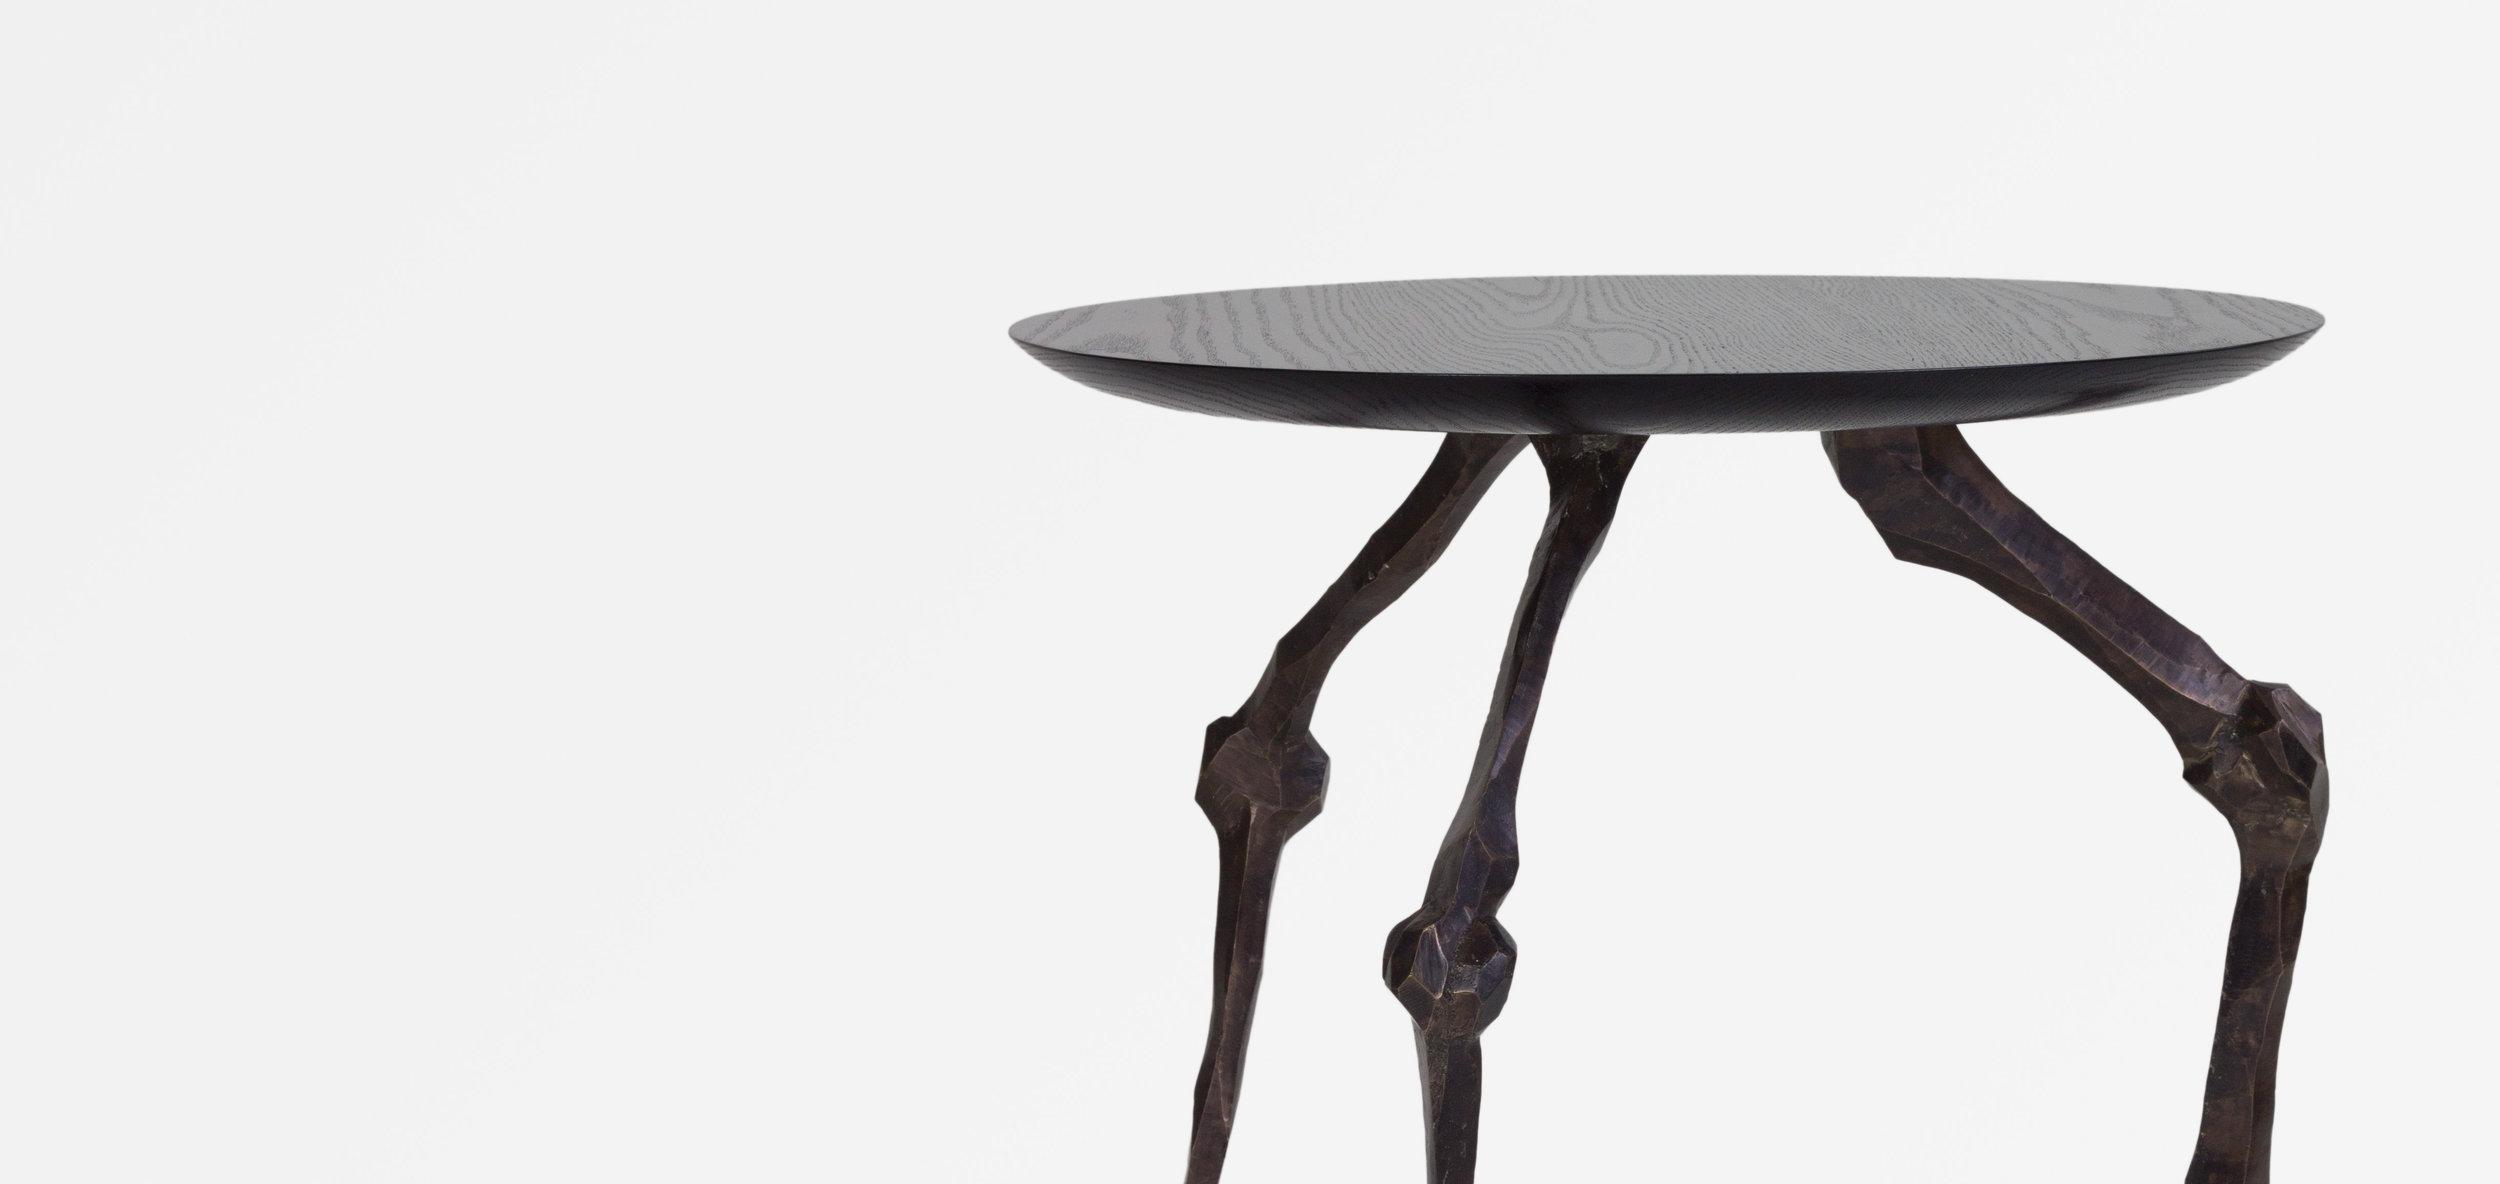 JAK-Creature-Table-001-close.jpg